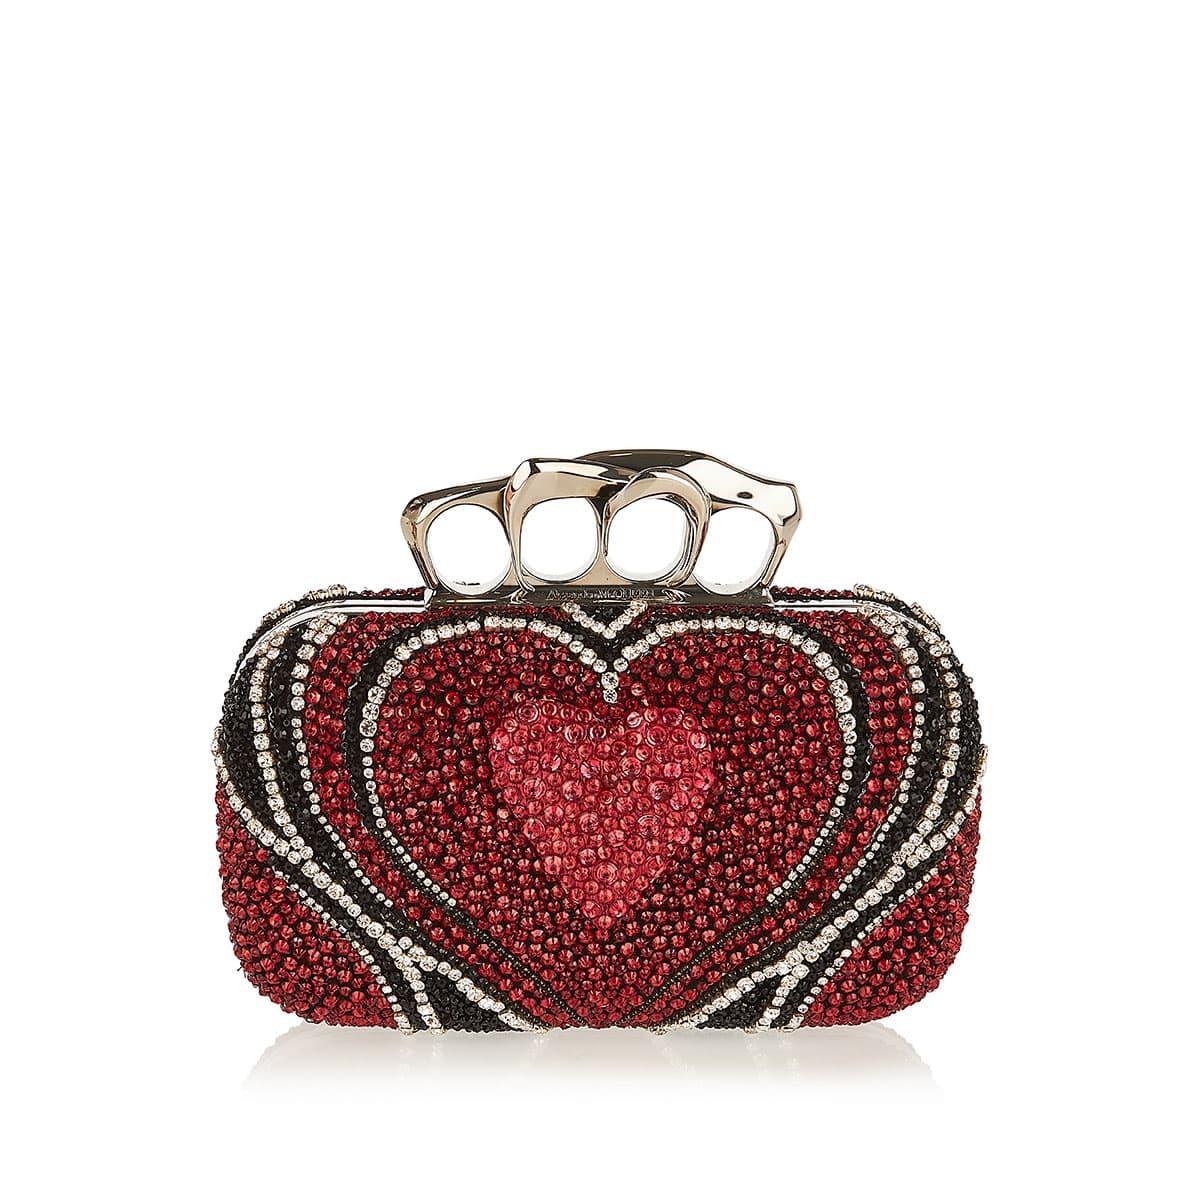 Four-Ring crystal-embellished clutch